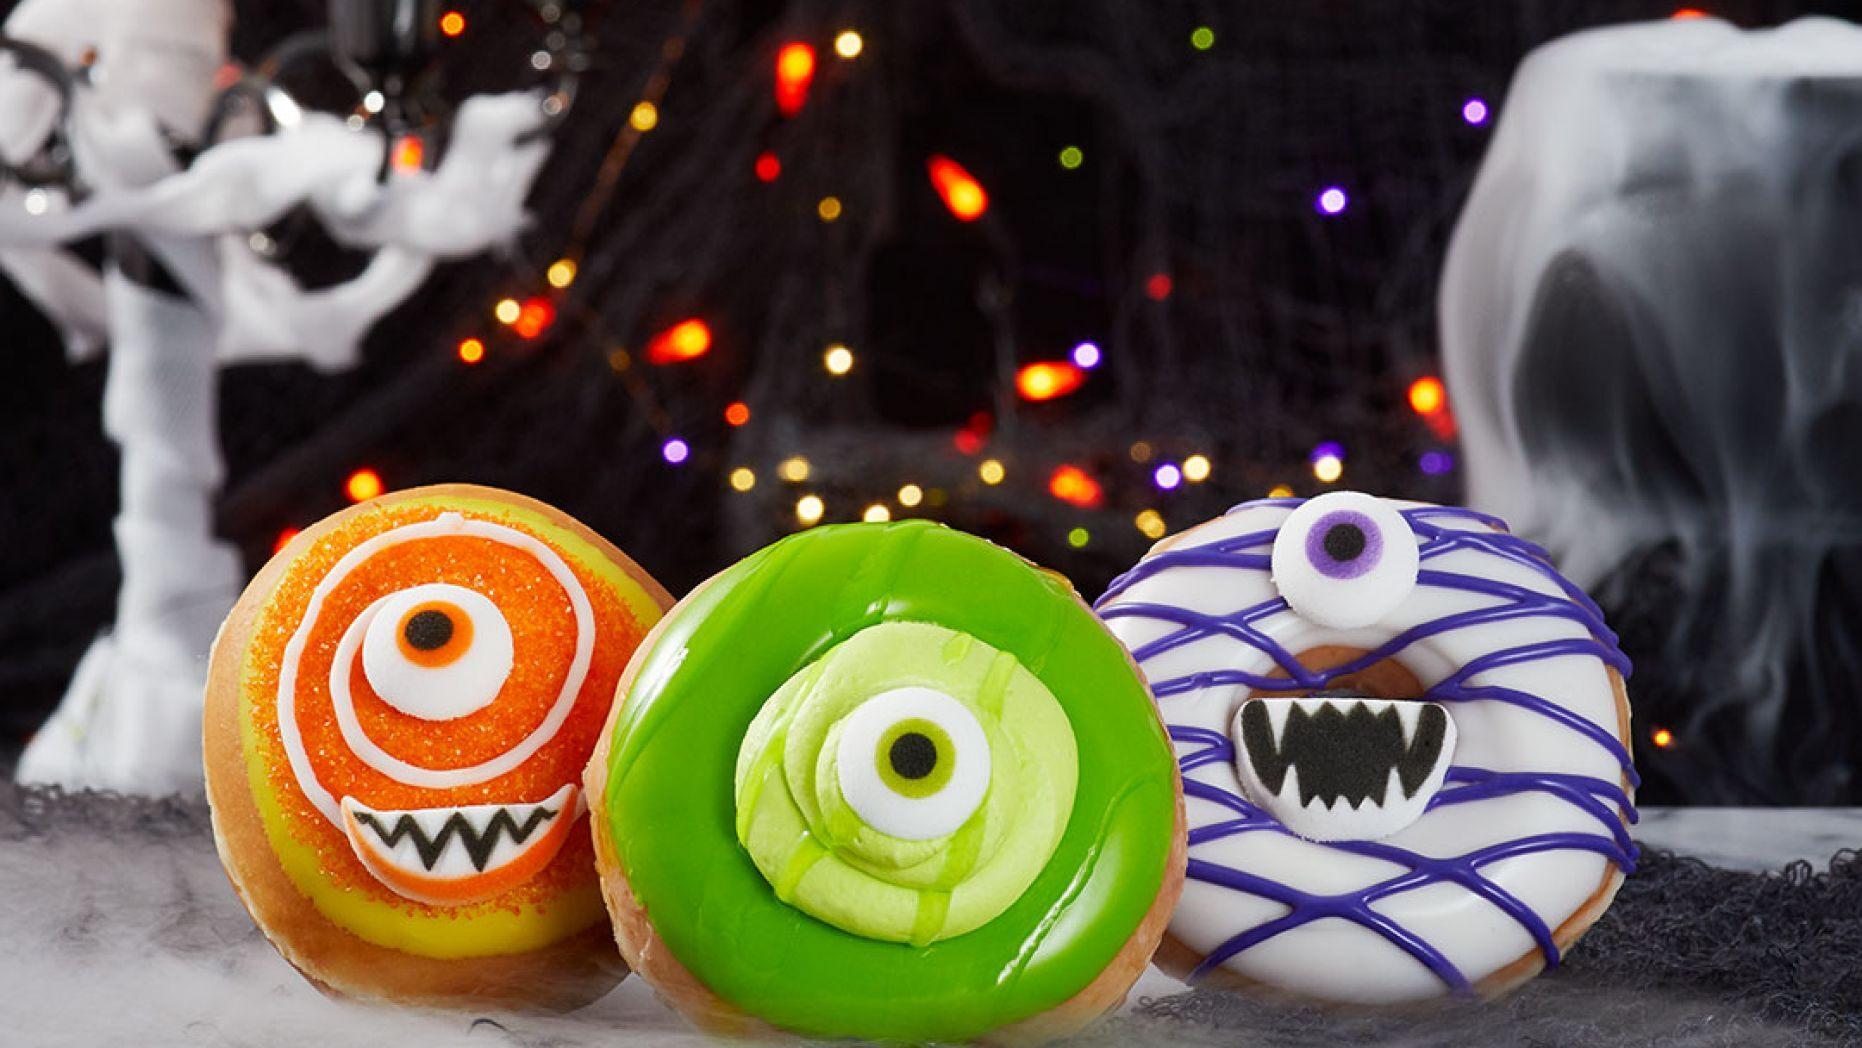 Krispy Kreme Halloween Donuts 2020 Krispy Kreme debuts Halloween themed doughnuts | KRON4